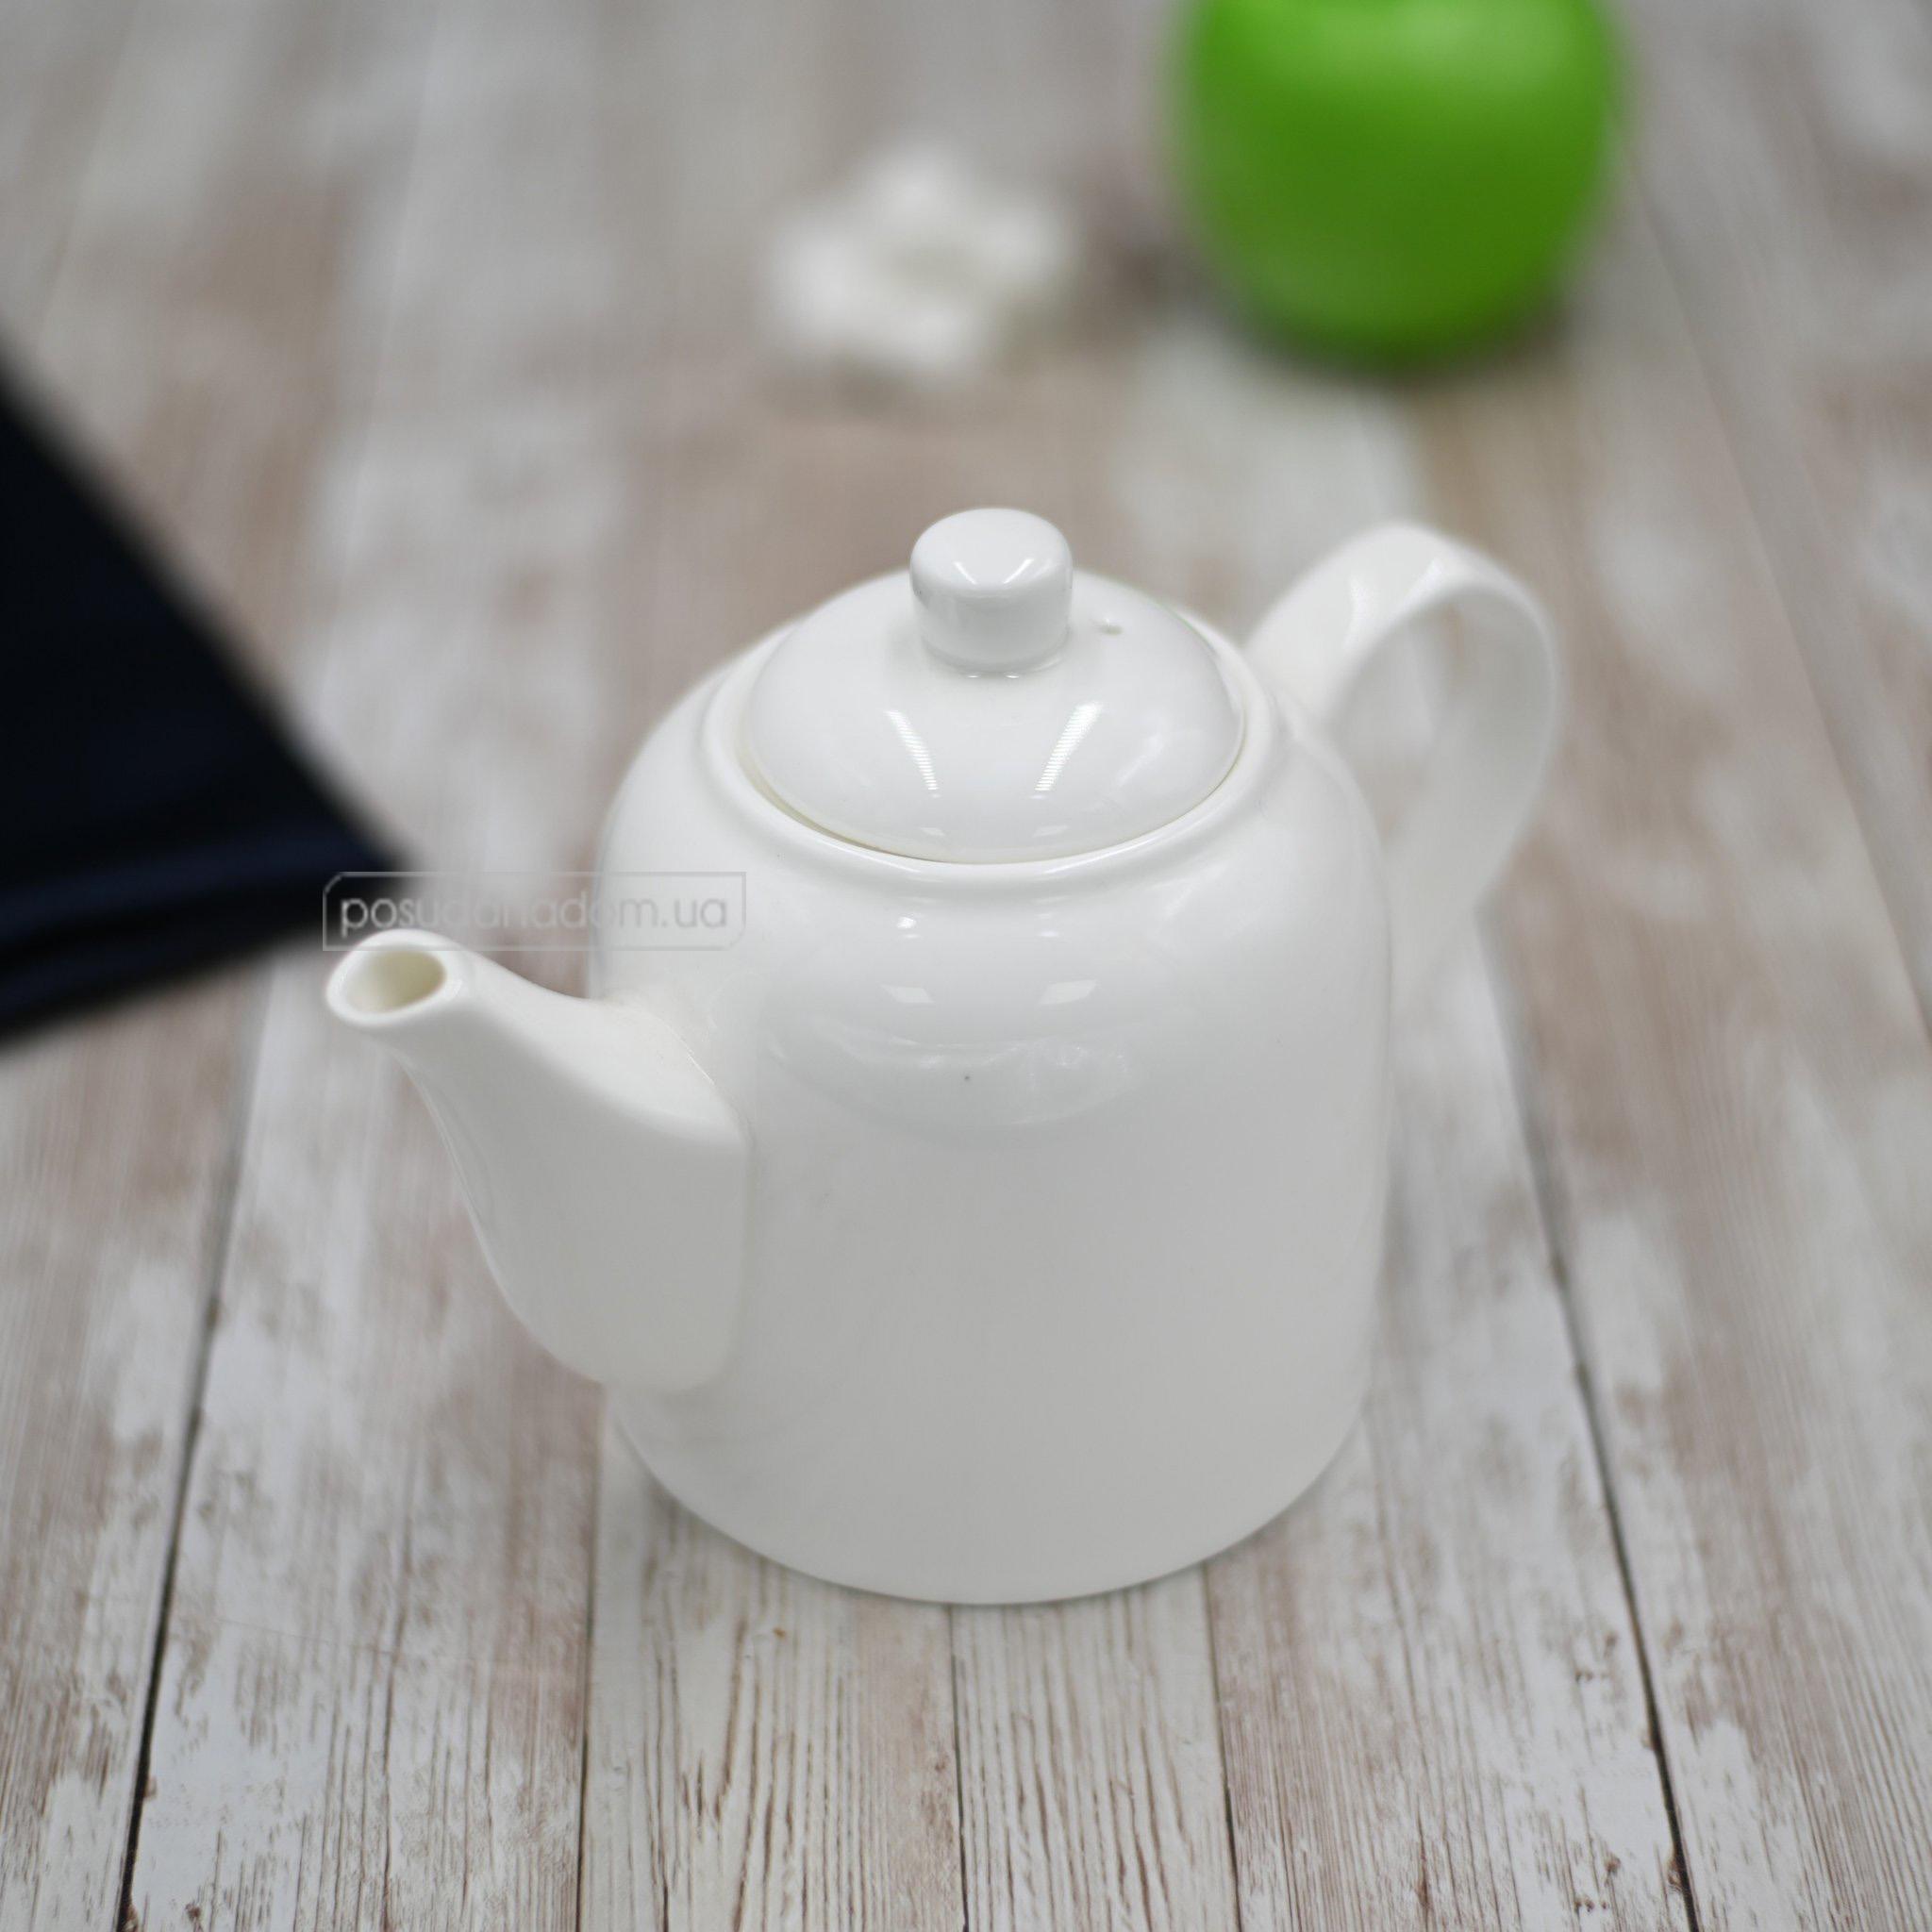 Чайник заварочный Wilmax 994033 0.5 л, недорого